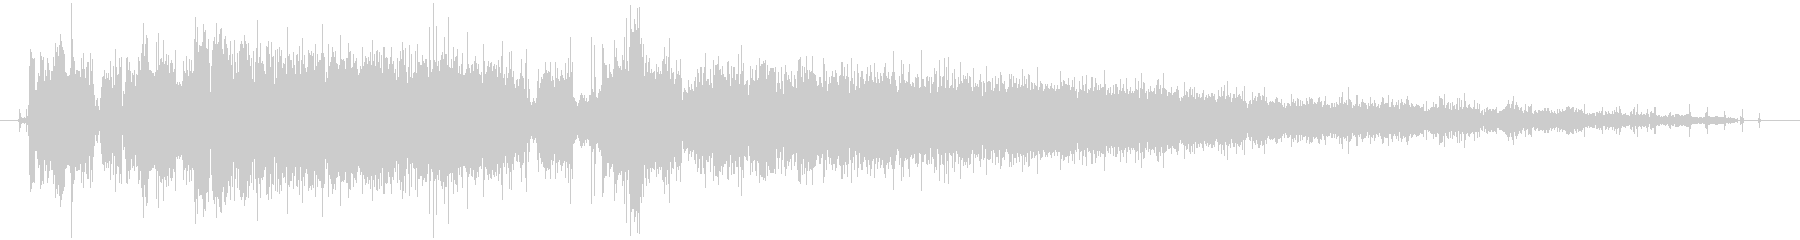 CINEMATIC BEEP 05の未再生の波形